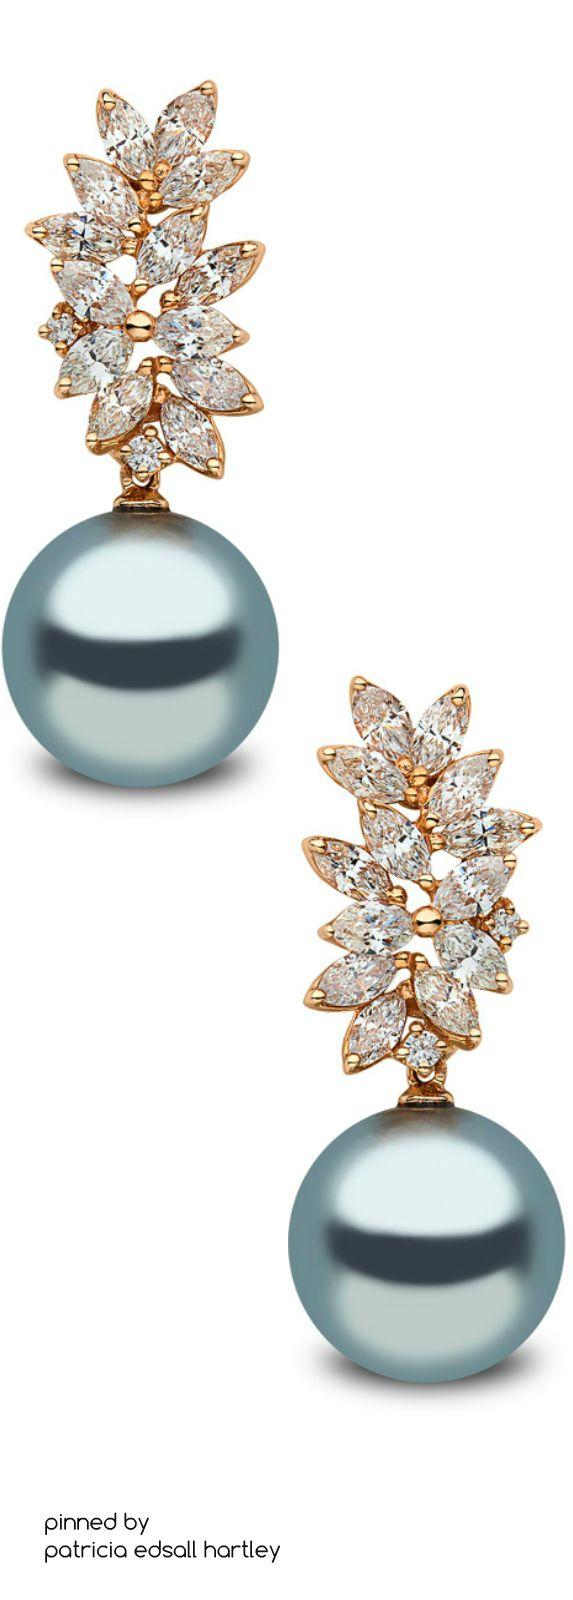 Best 25+ Pearl Earrings Ideas On Pinterest  Wedding Earrings Studs, Pearl  And Diamond Earrings And Pearl Earrings Wedding